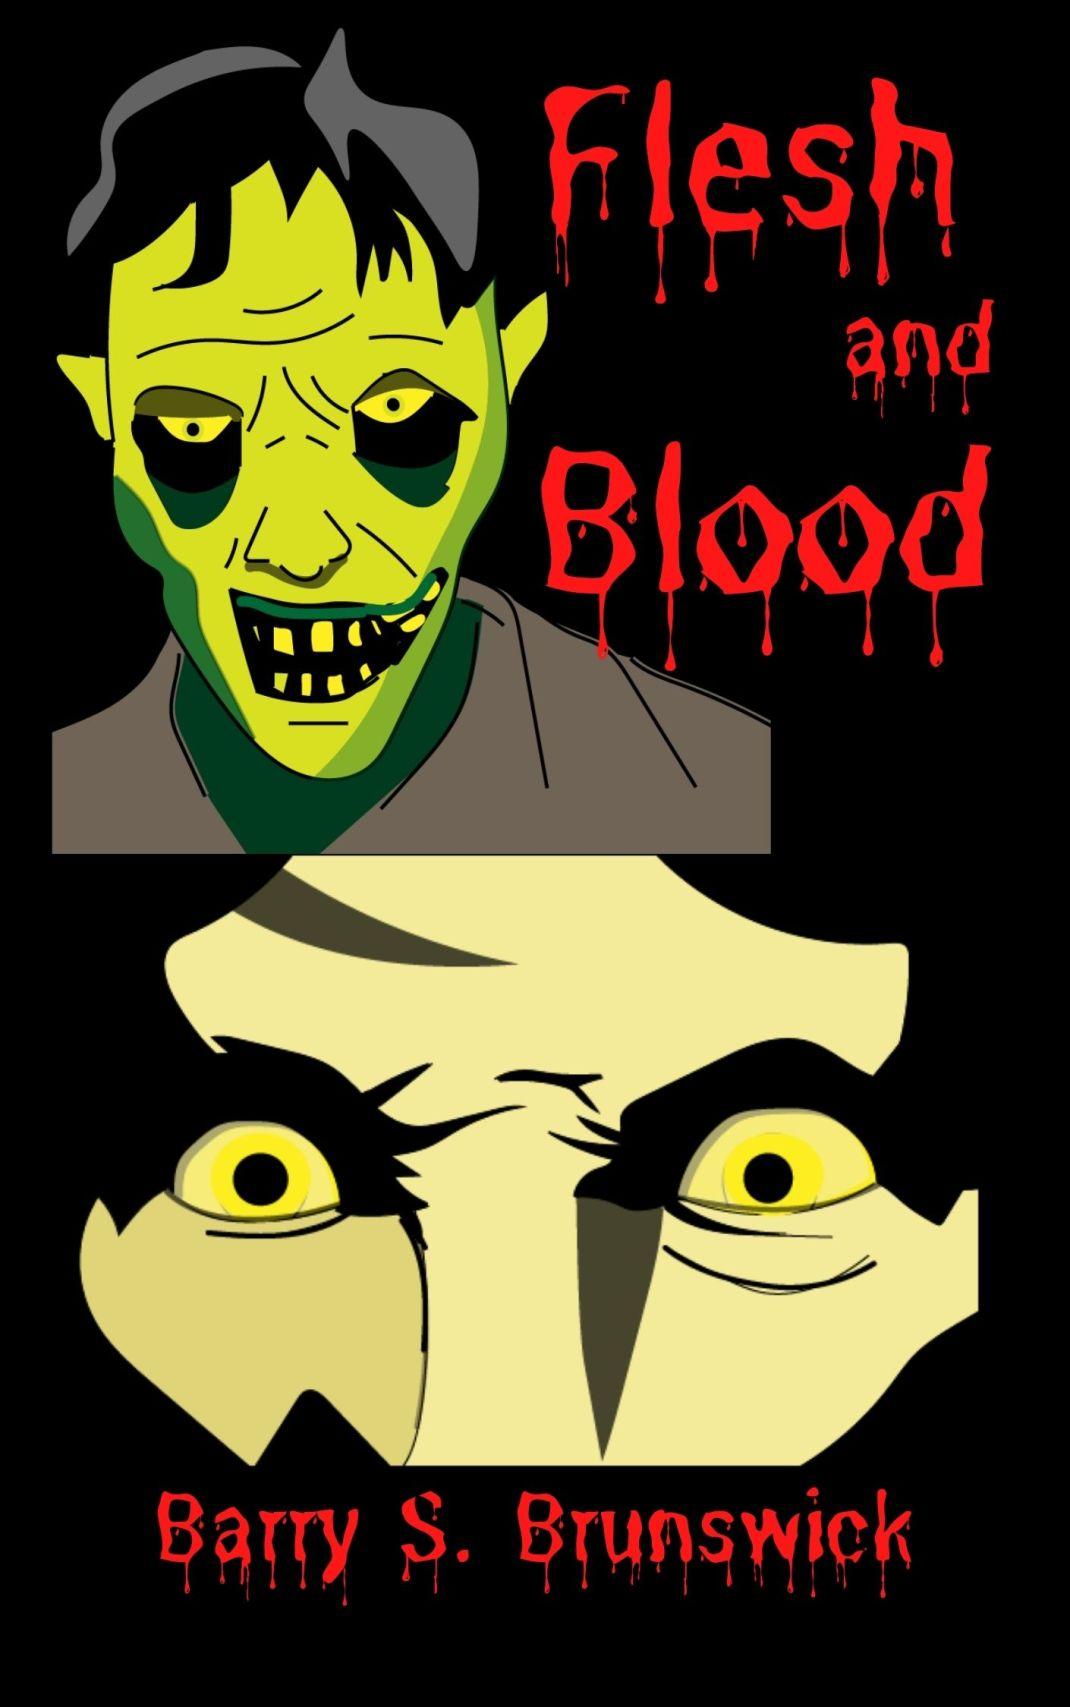 Barry-S-Brunswick-Flesh-and-Blood-Book